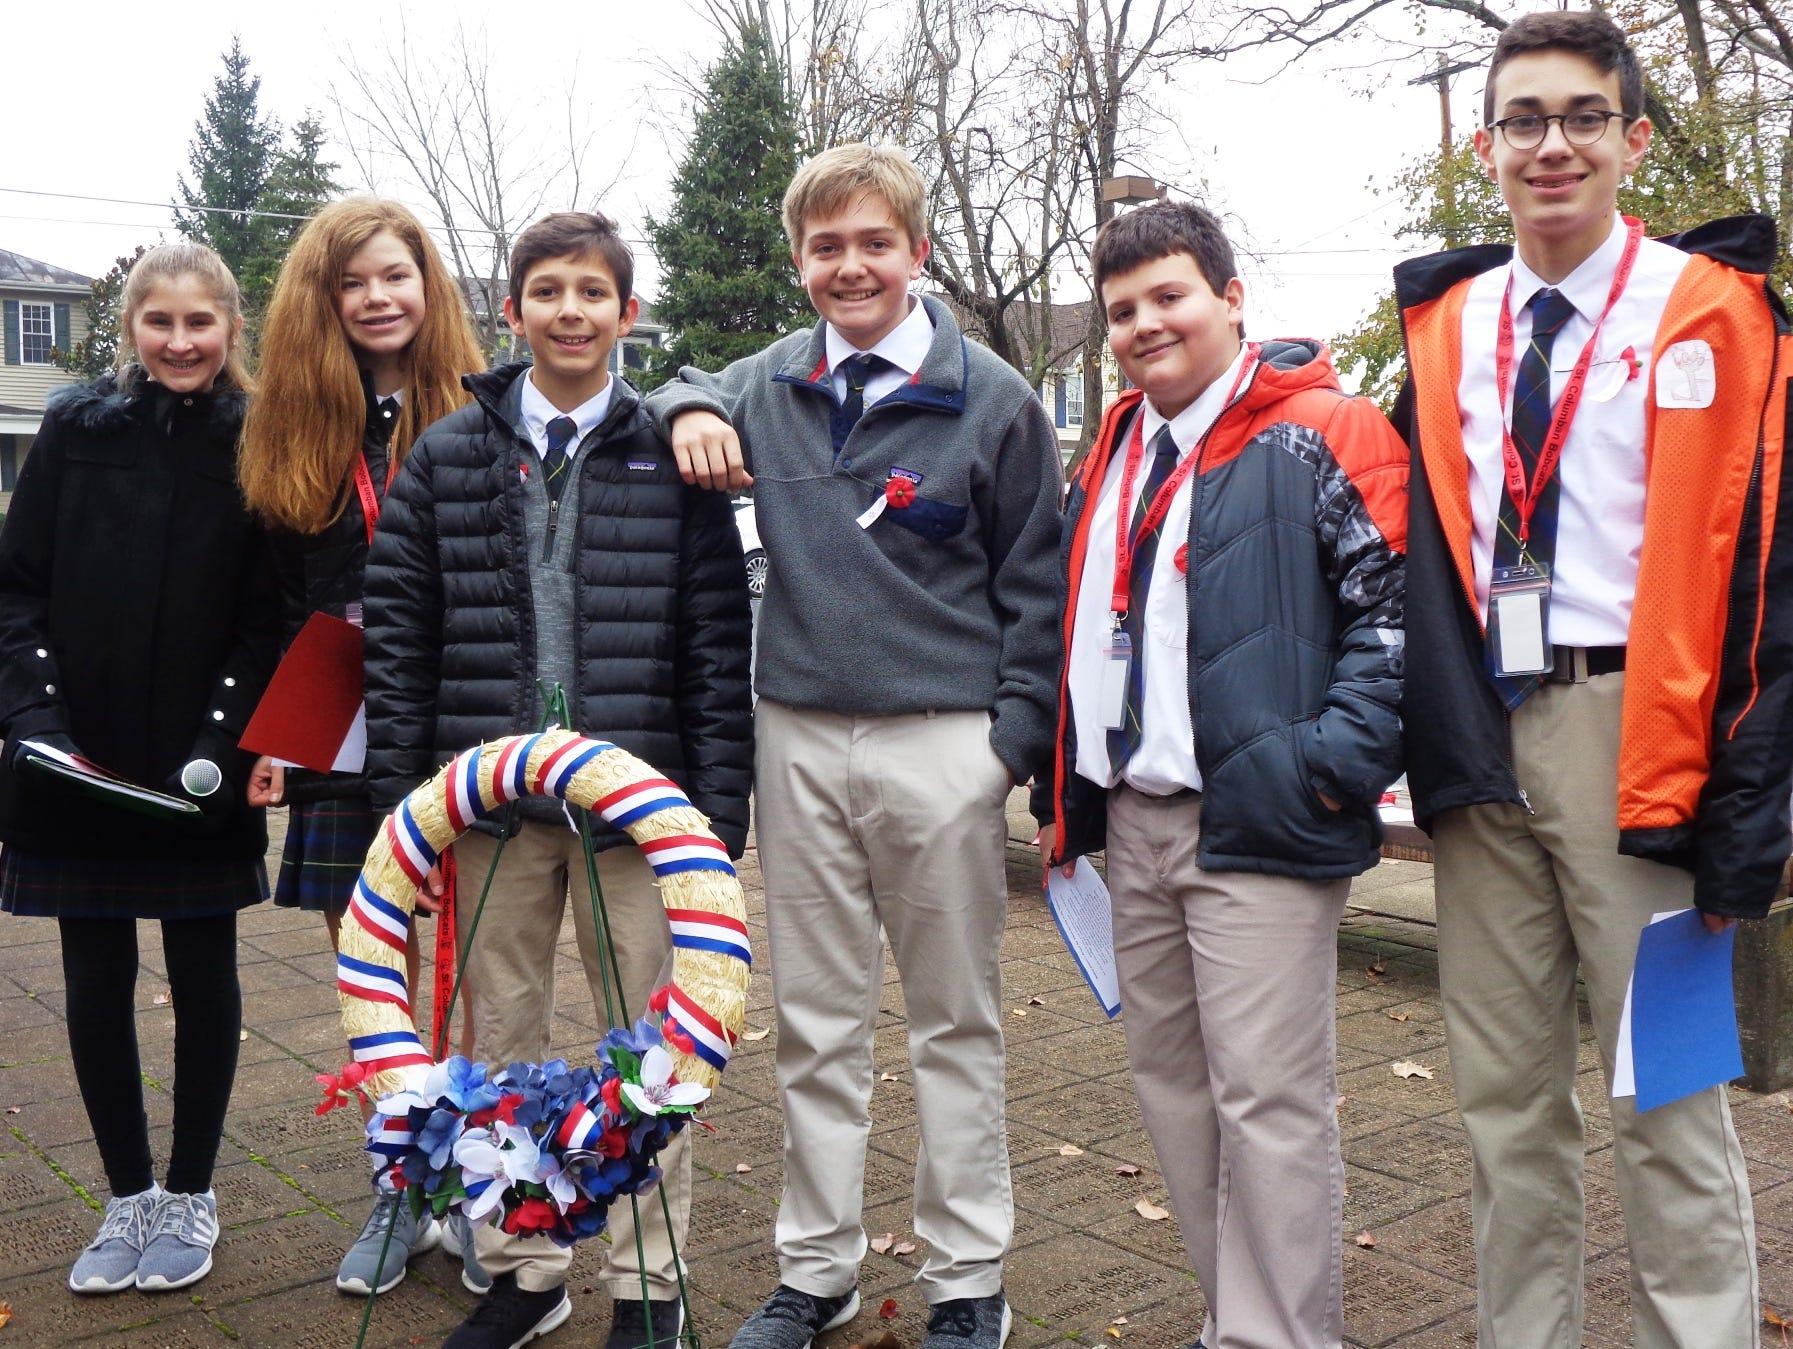 Ella Skolnicki, Sophie Seavey, Dominic Infantino, Sam Hawkins, Nick Worpenberg and Teddy Andrews, St. Columban eighth-grade Student Council, led the Veteran's Day ceremony in Loveland.